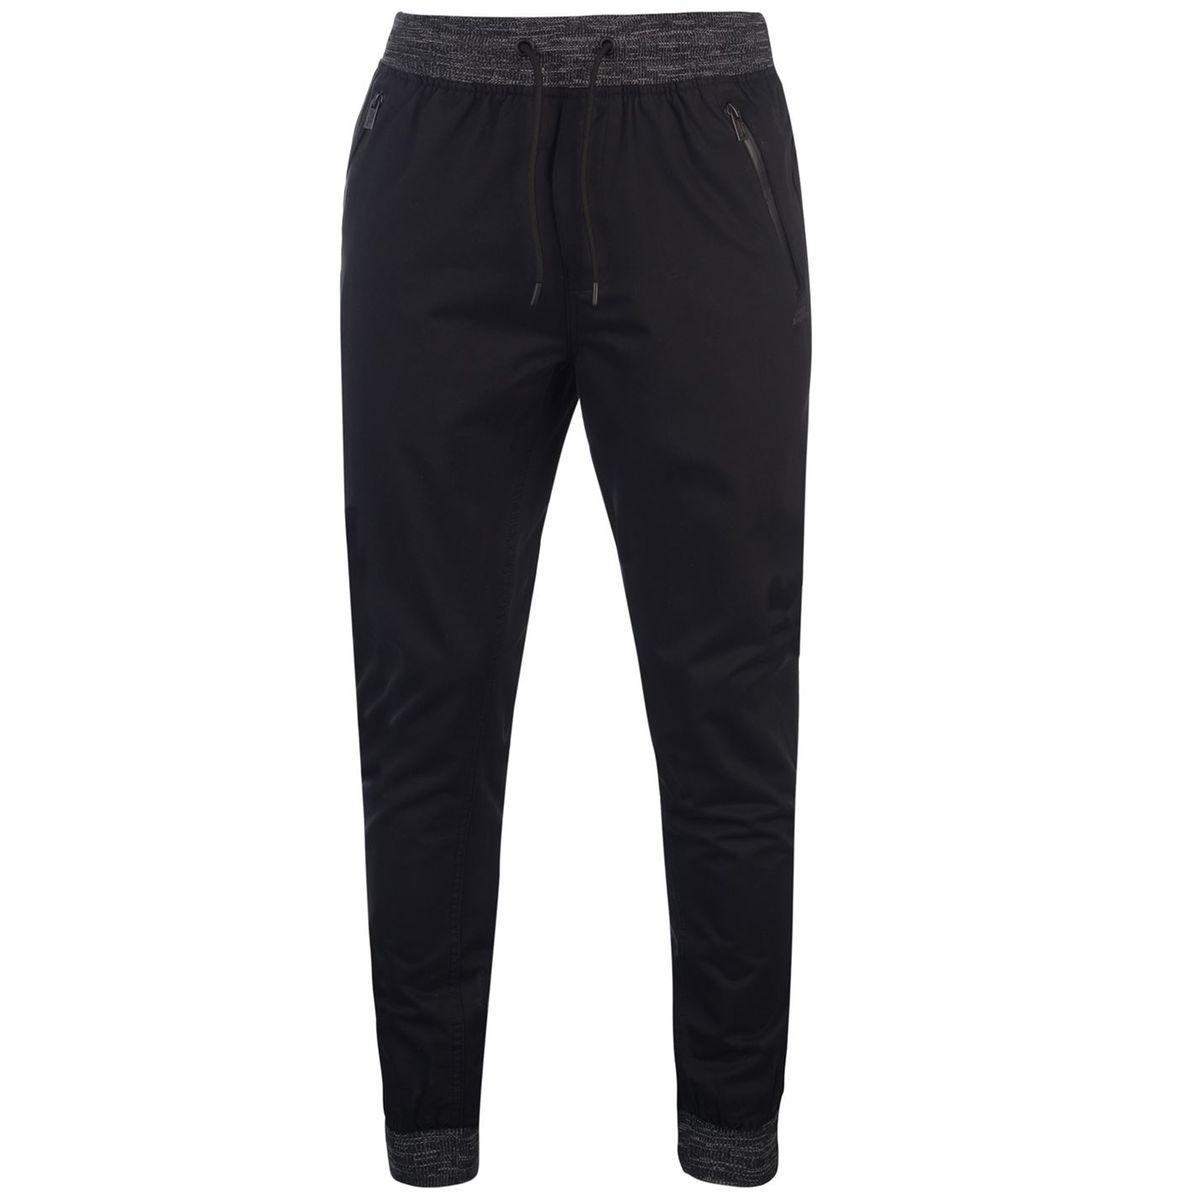 Pantalon chino taille élastique